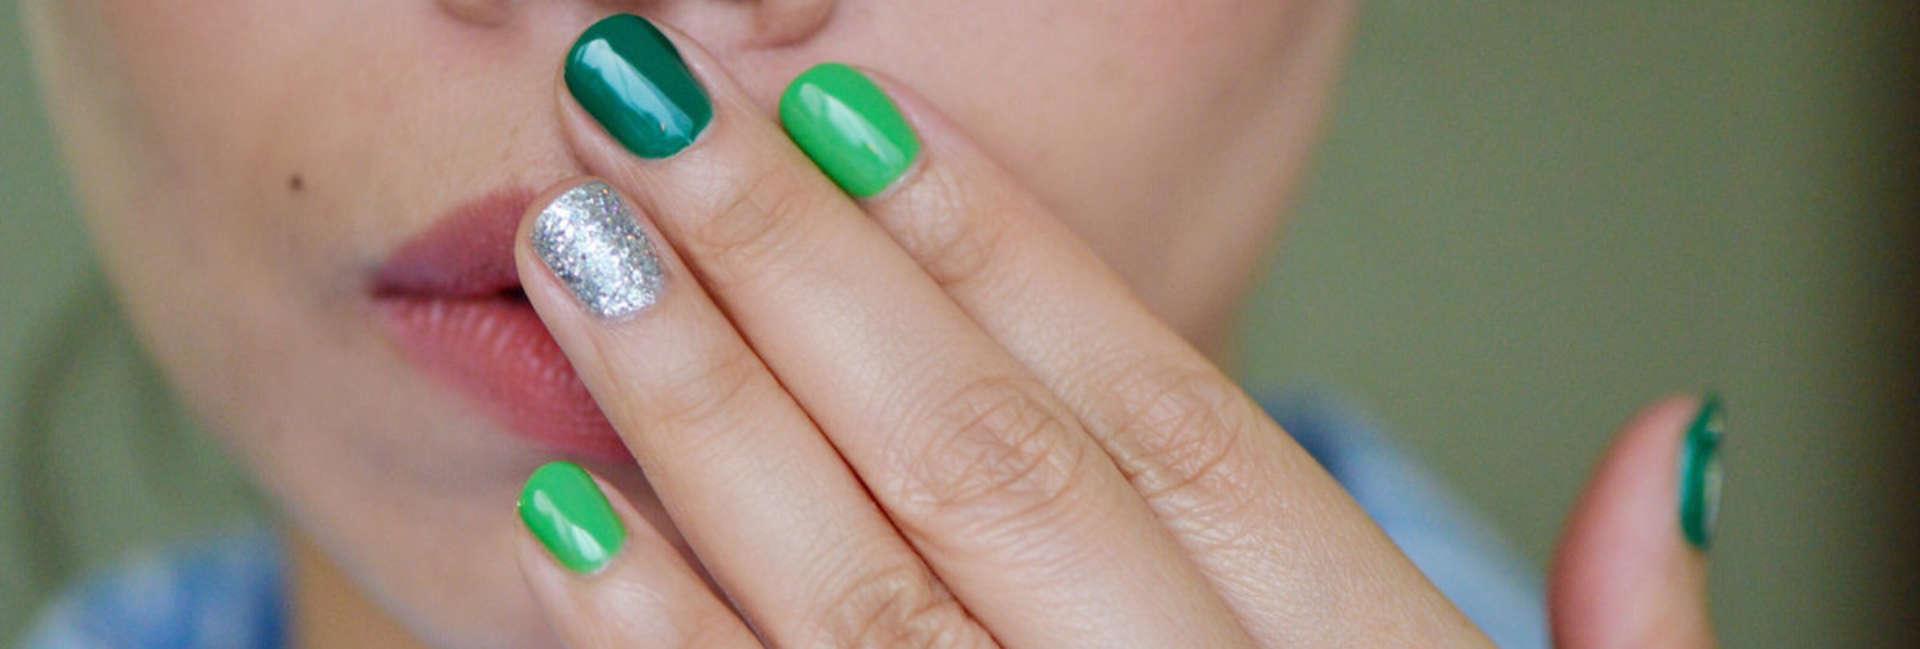 The rainbow manicure